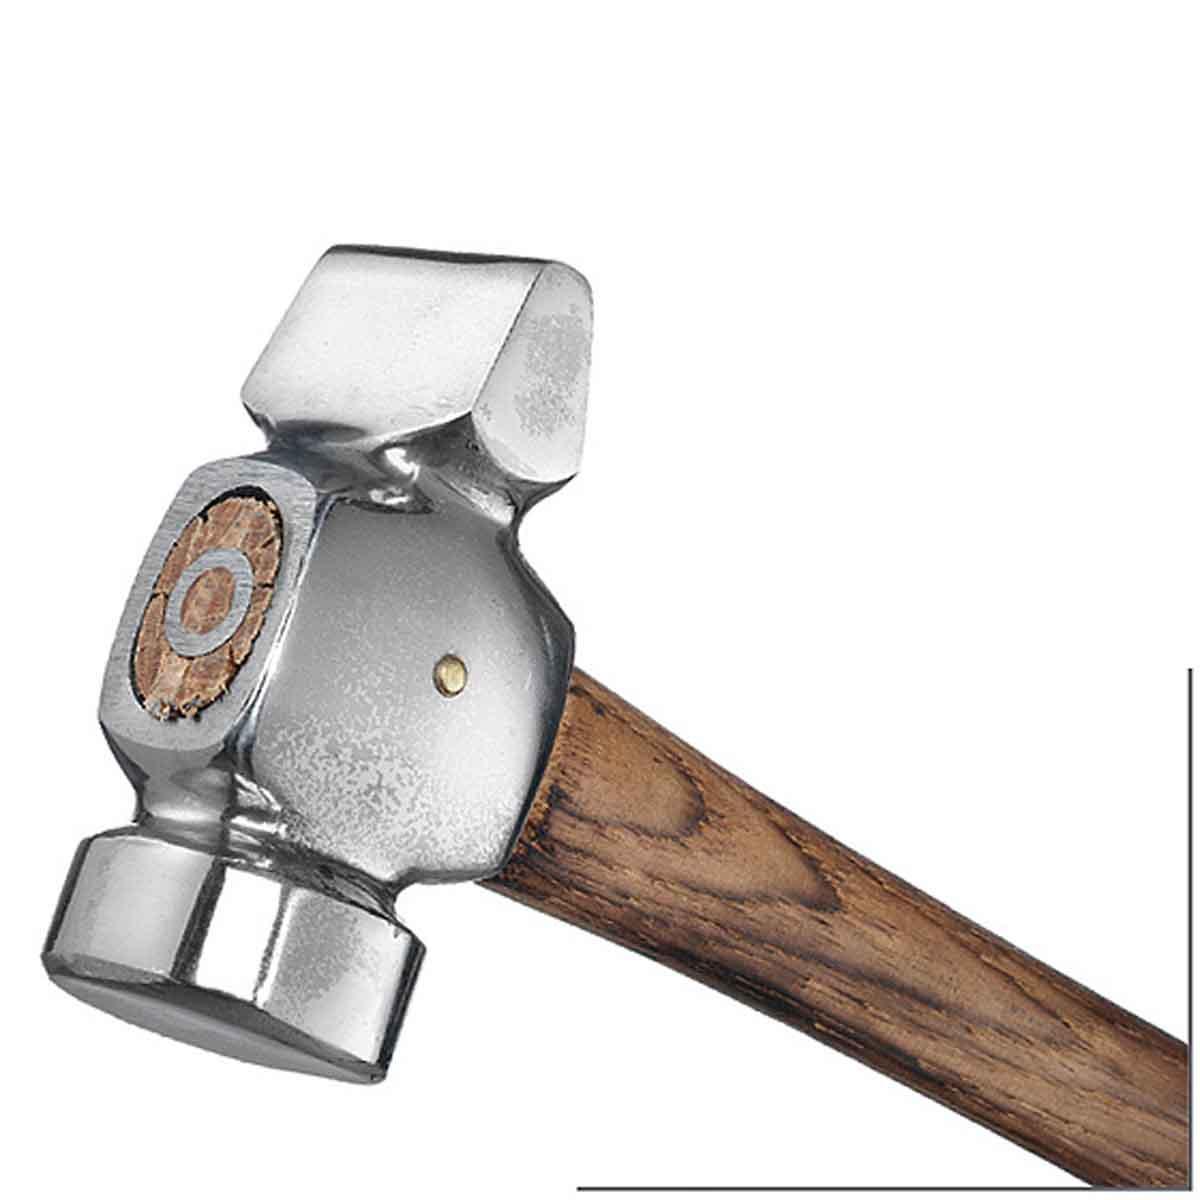 Jim Blurton Clipping Hammers